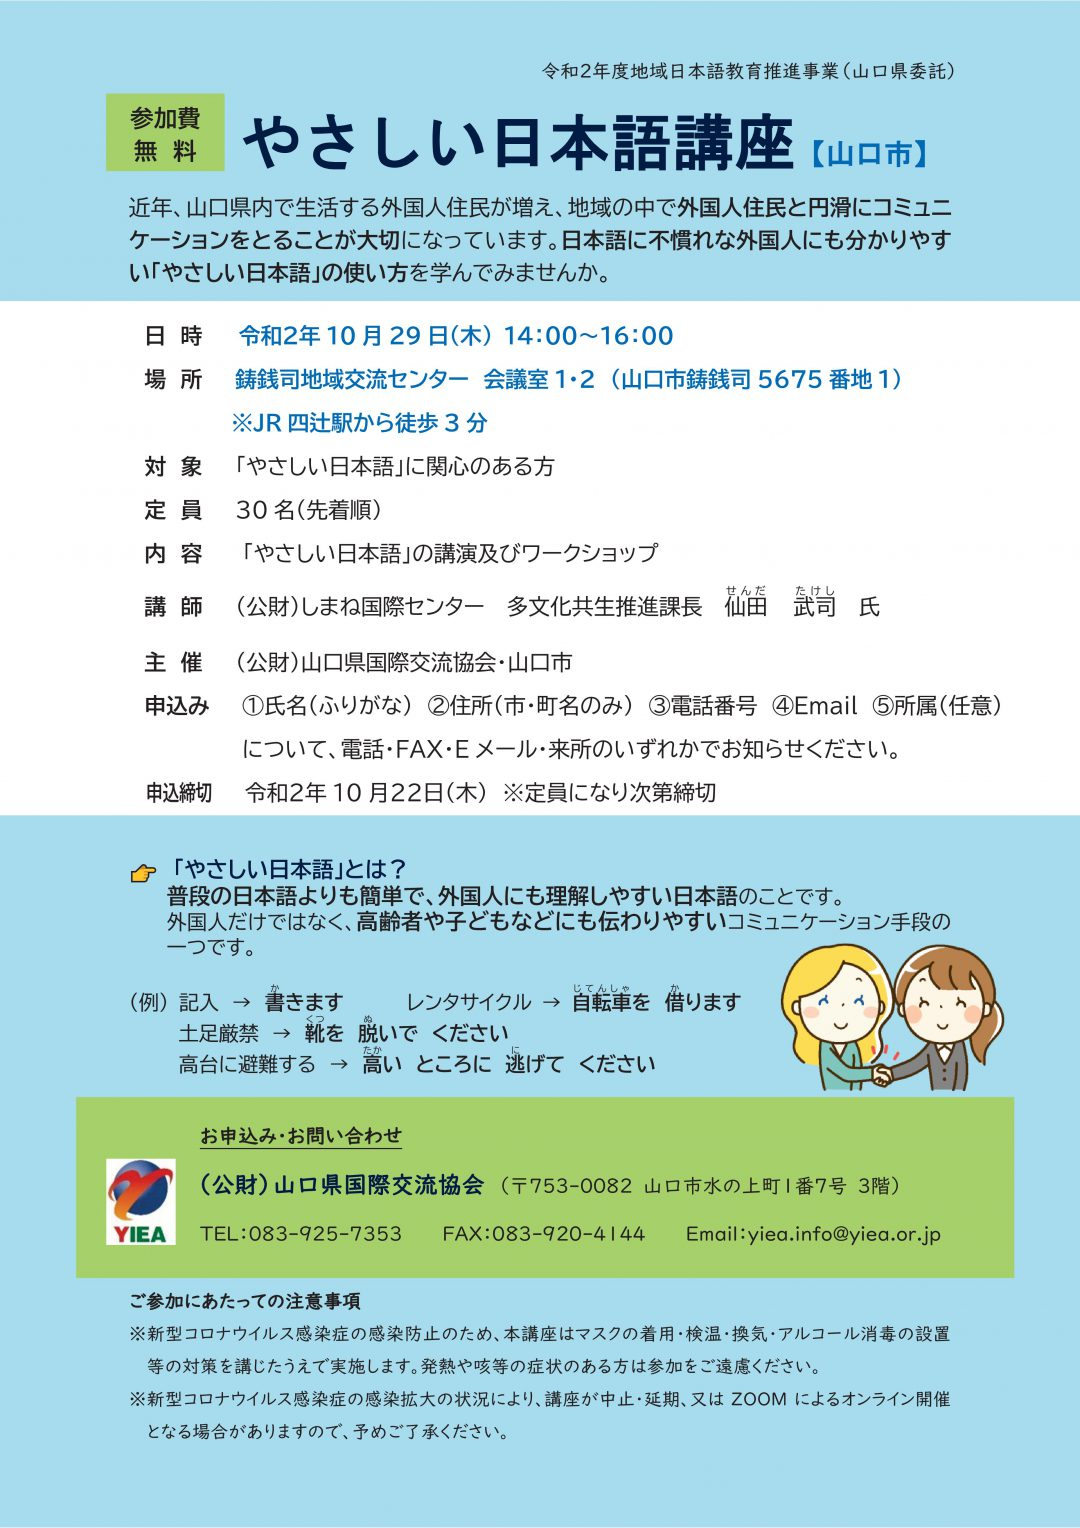 画像:令和2年度地域日本語教育推進事業(山口県委託)やさしい日本語講座【山口市】